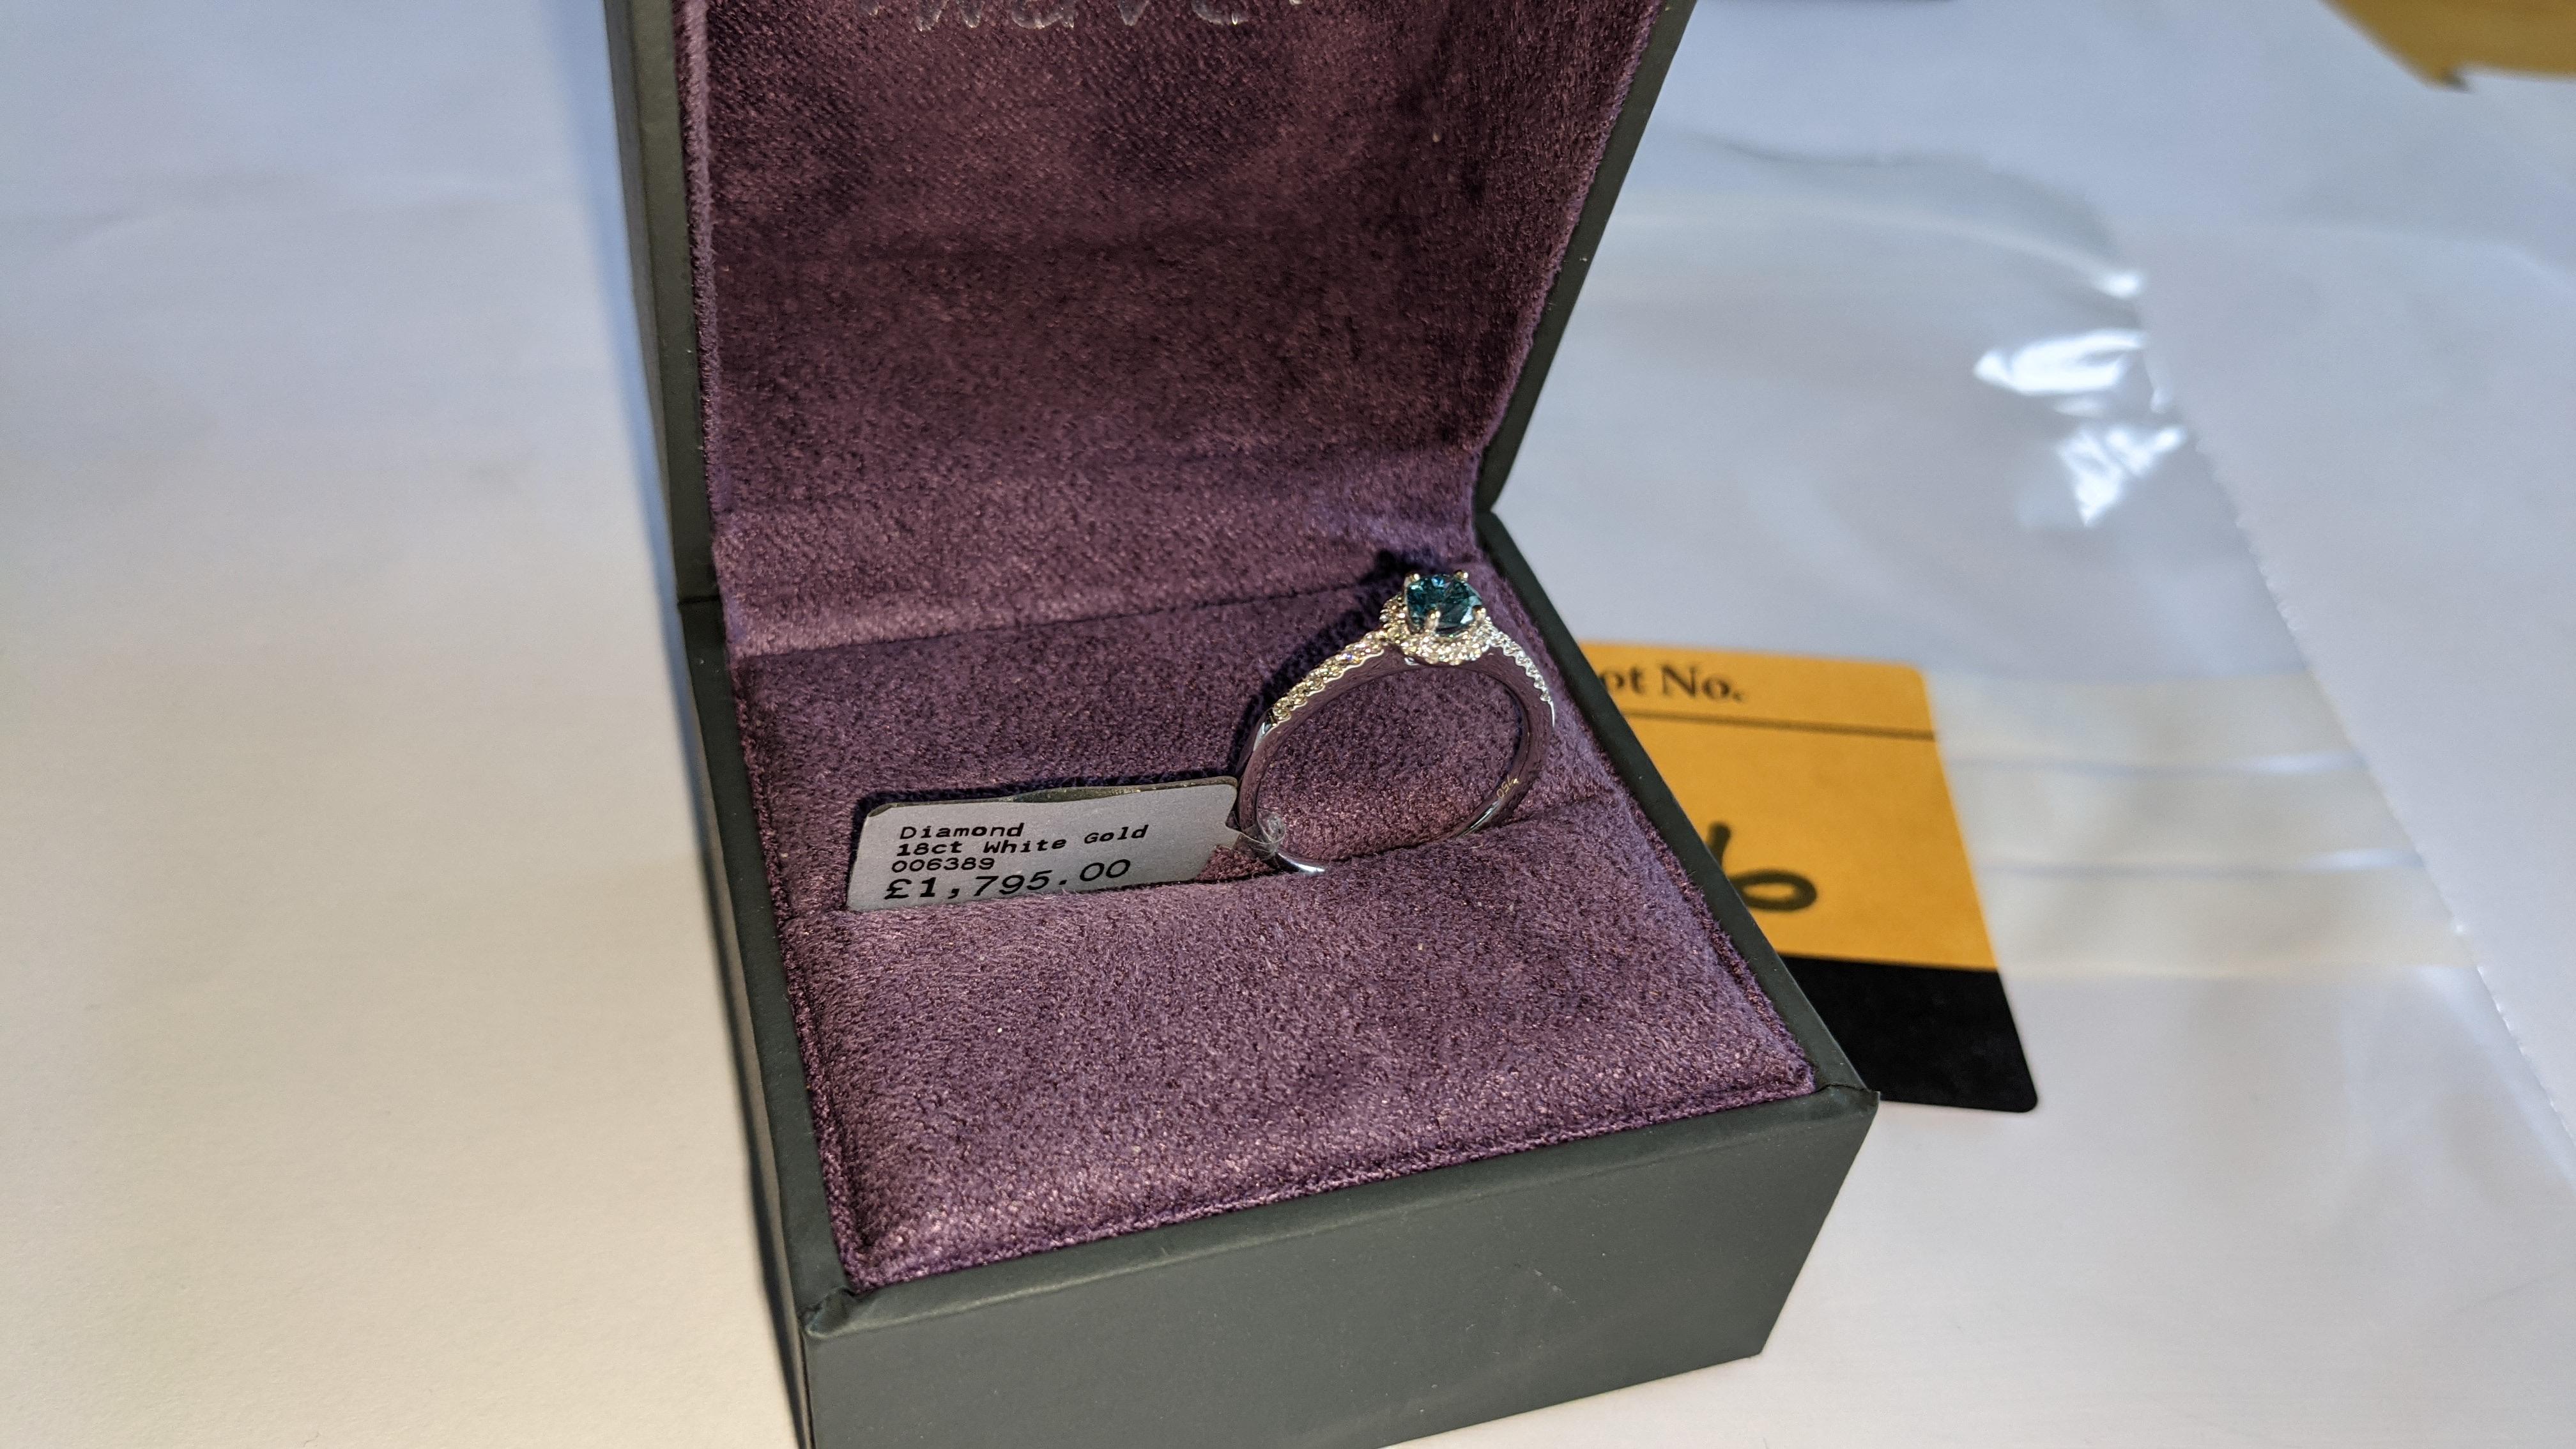 18ct white gold & diamond ring with 0.30ct blue diamond & 0.1ct of additional diamonds around the ce - Image 3 of 19